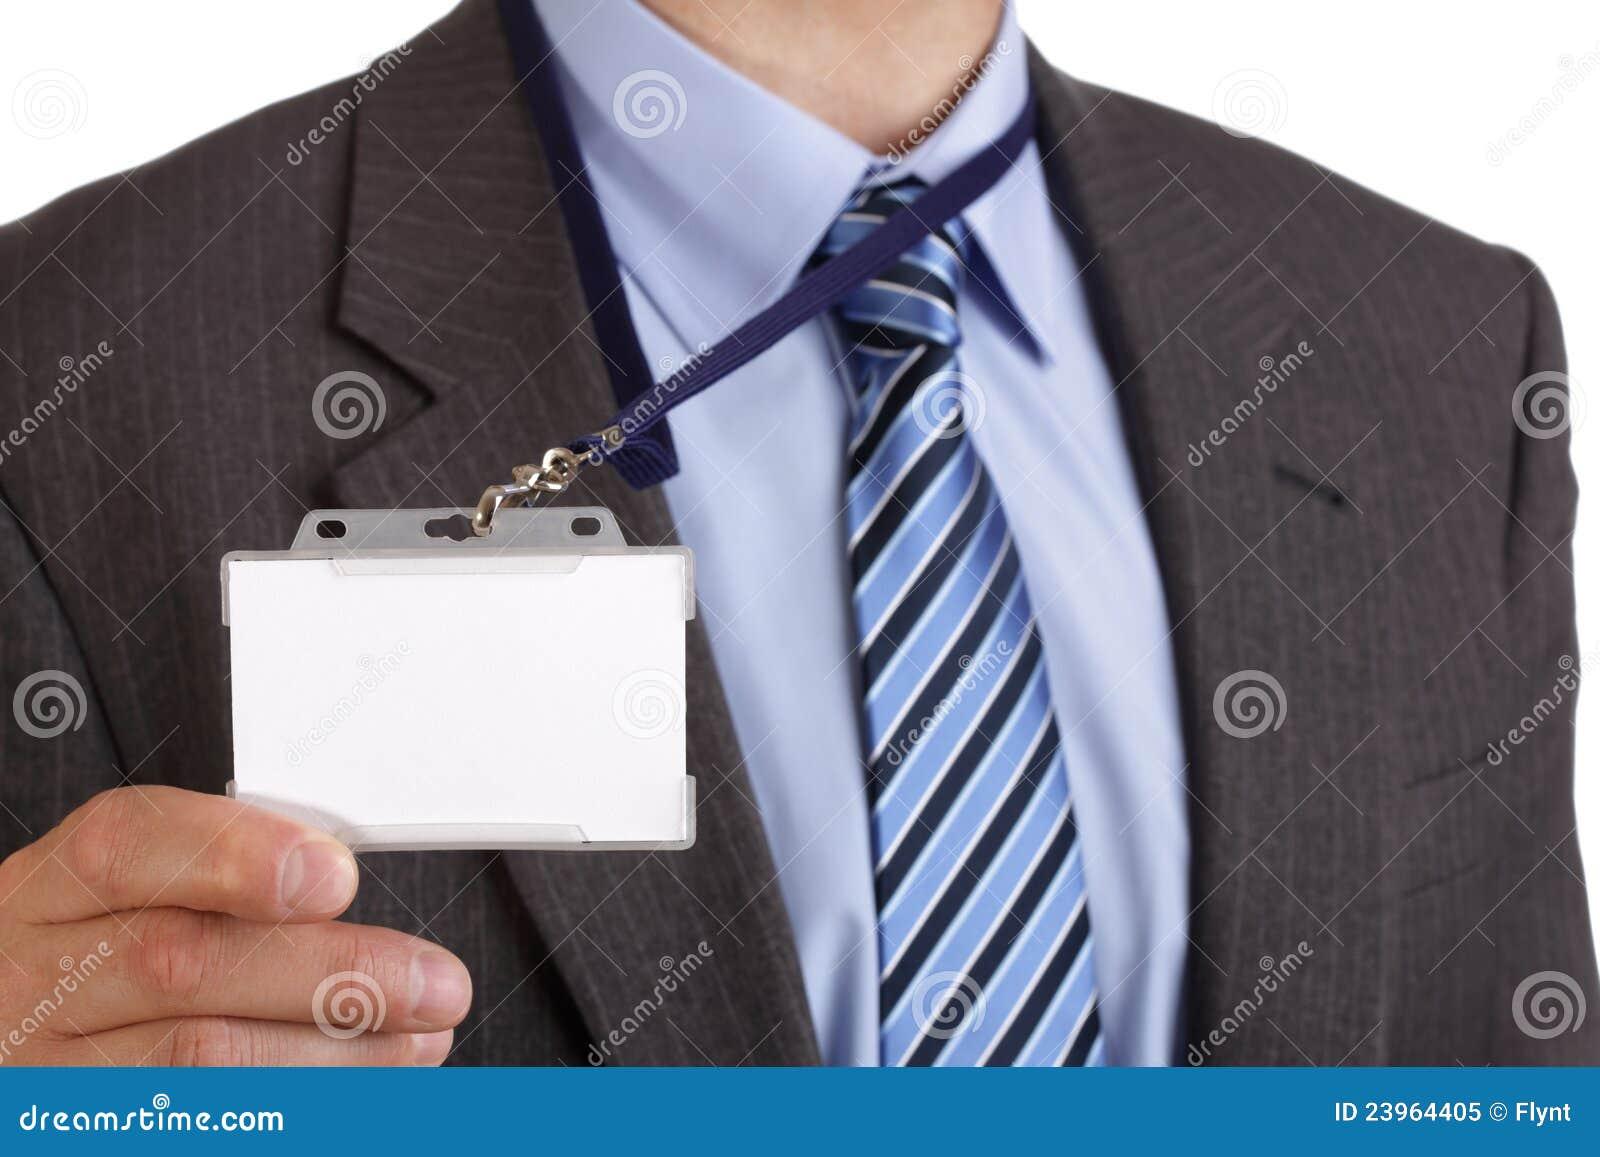 Businessman Holding Blank Id Badge Royalty Free Stock